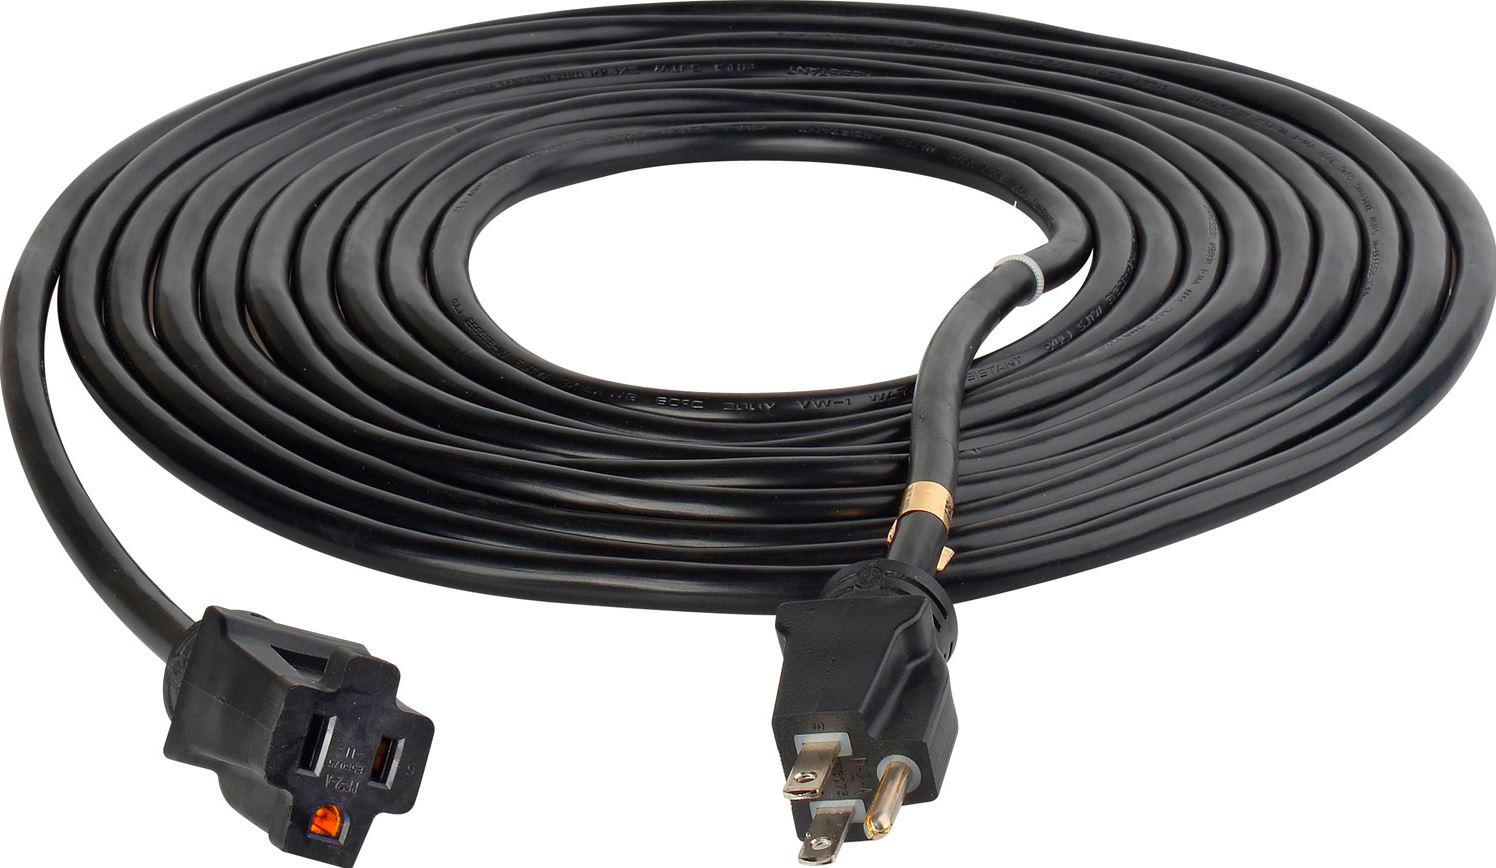 Black ProStar 12 Gauge SJTW 3 Conductor 100 Foot Extension Cord